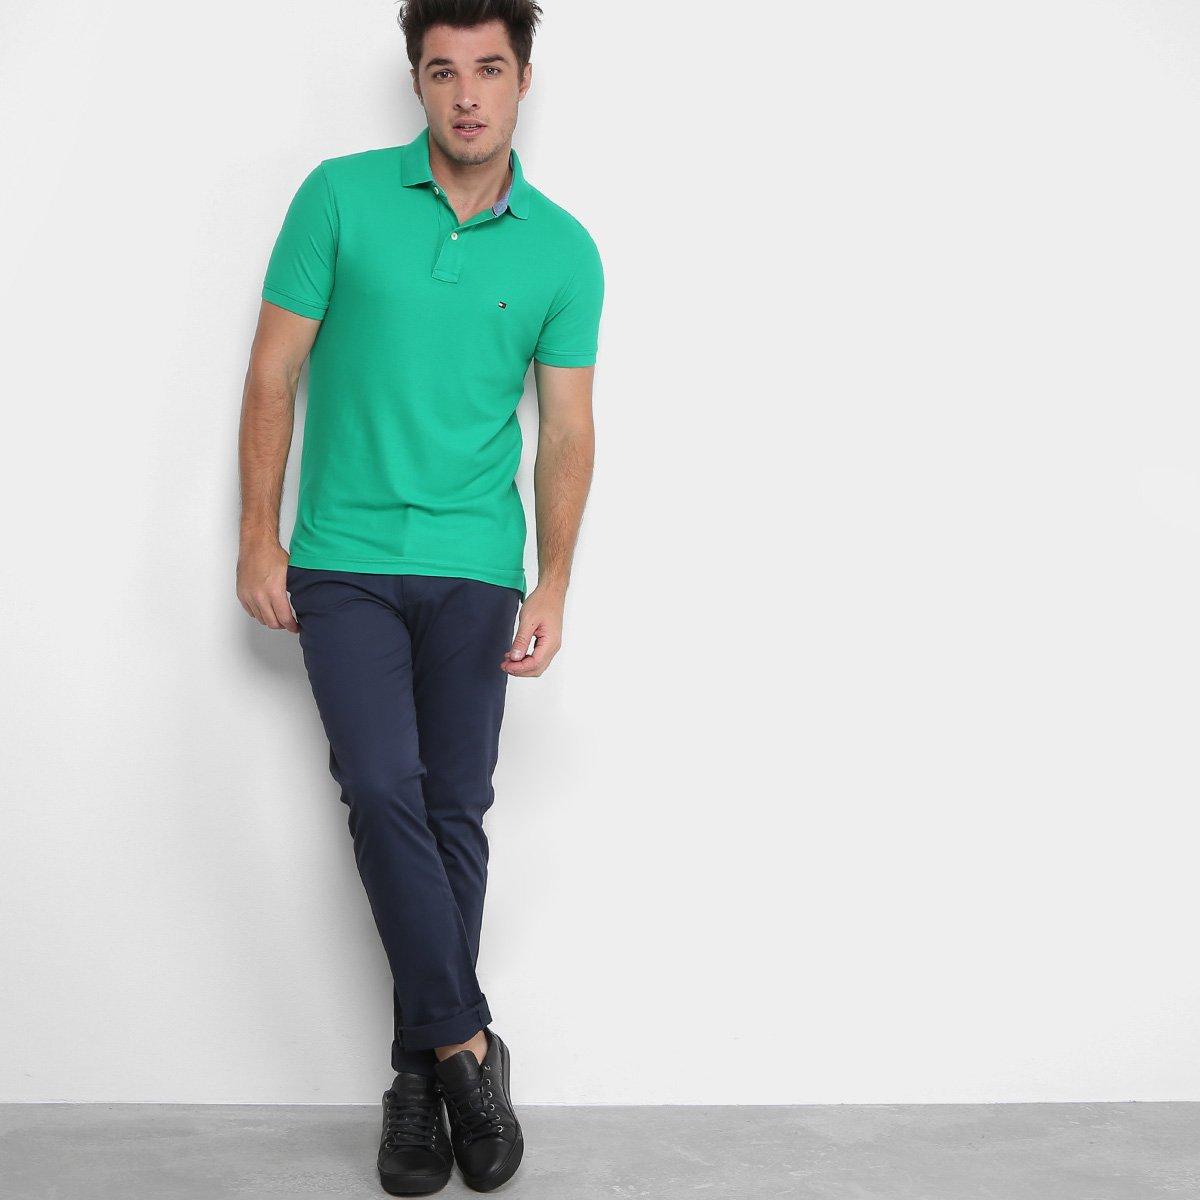 Camisa Polo Tommy Hilfiger Performance Slim Masculina - Compre Agora ... 31951a15ed701